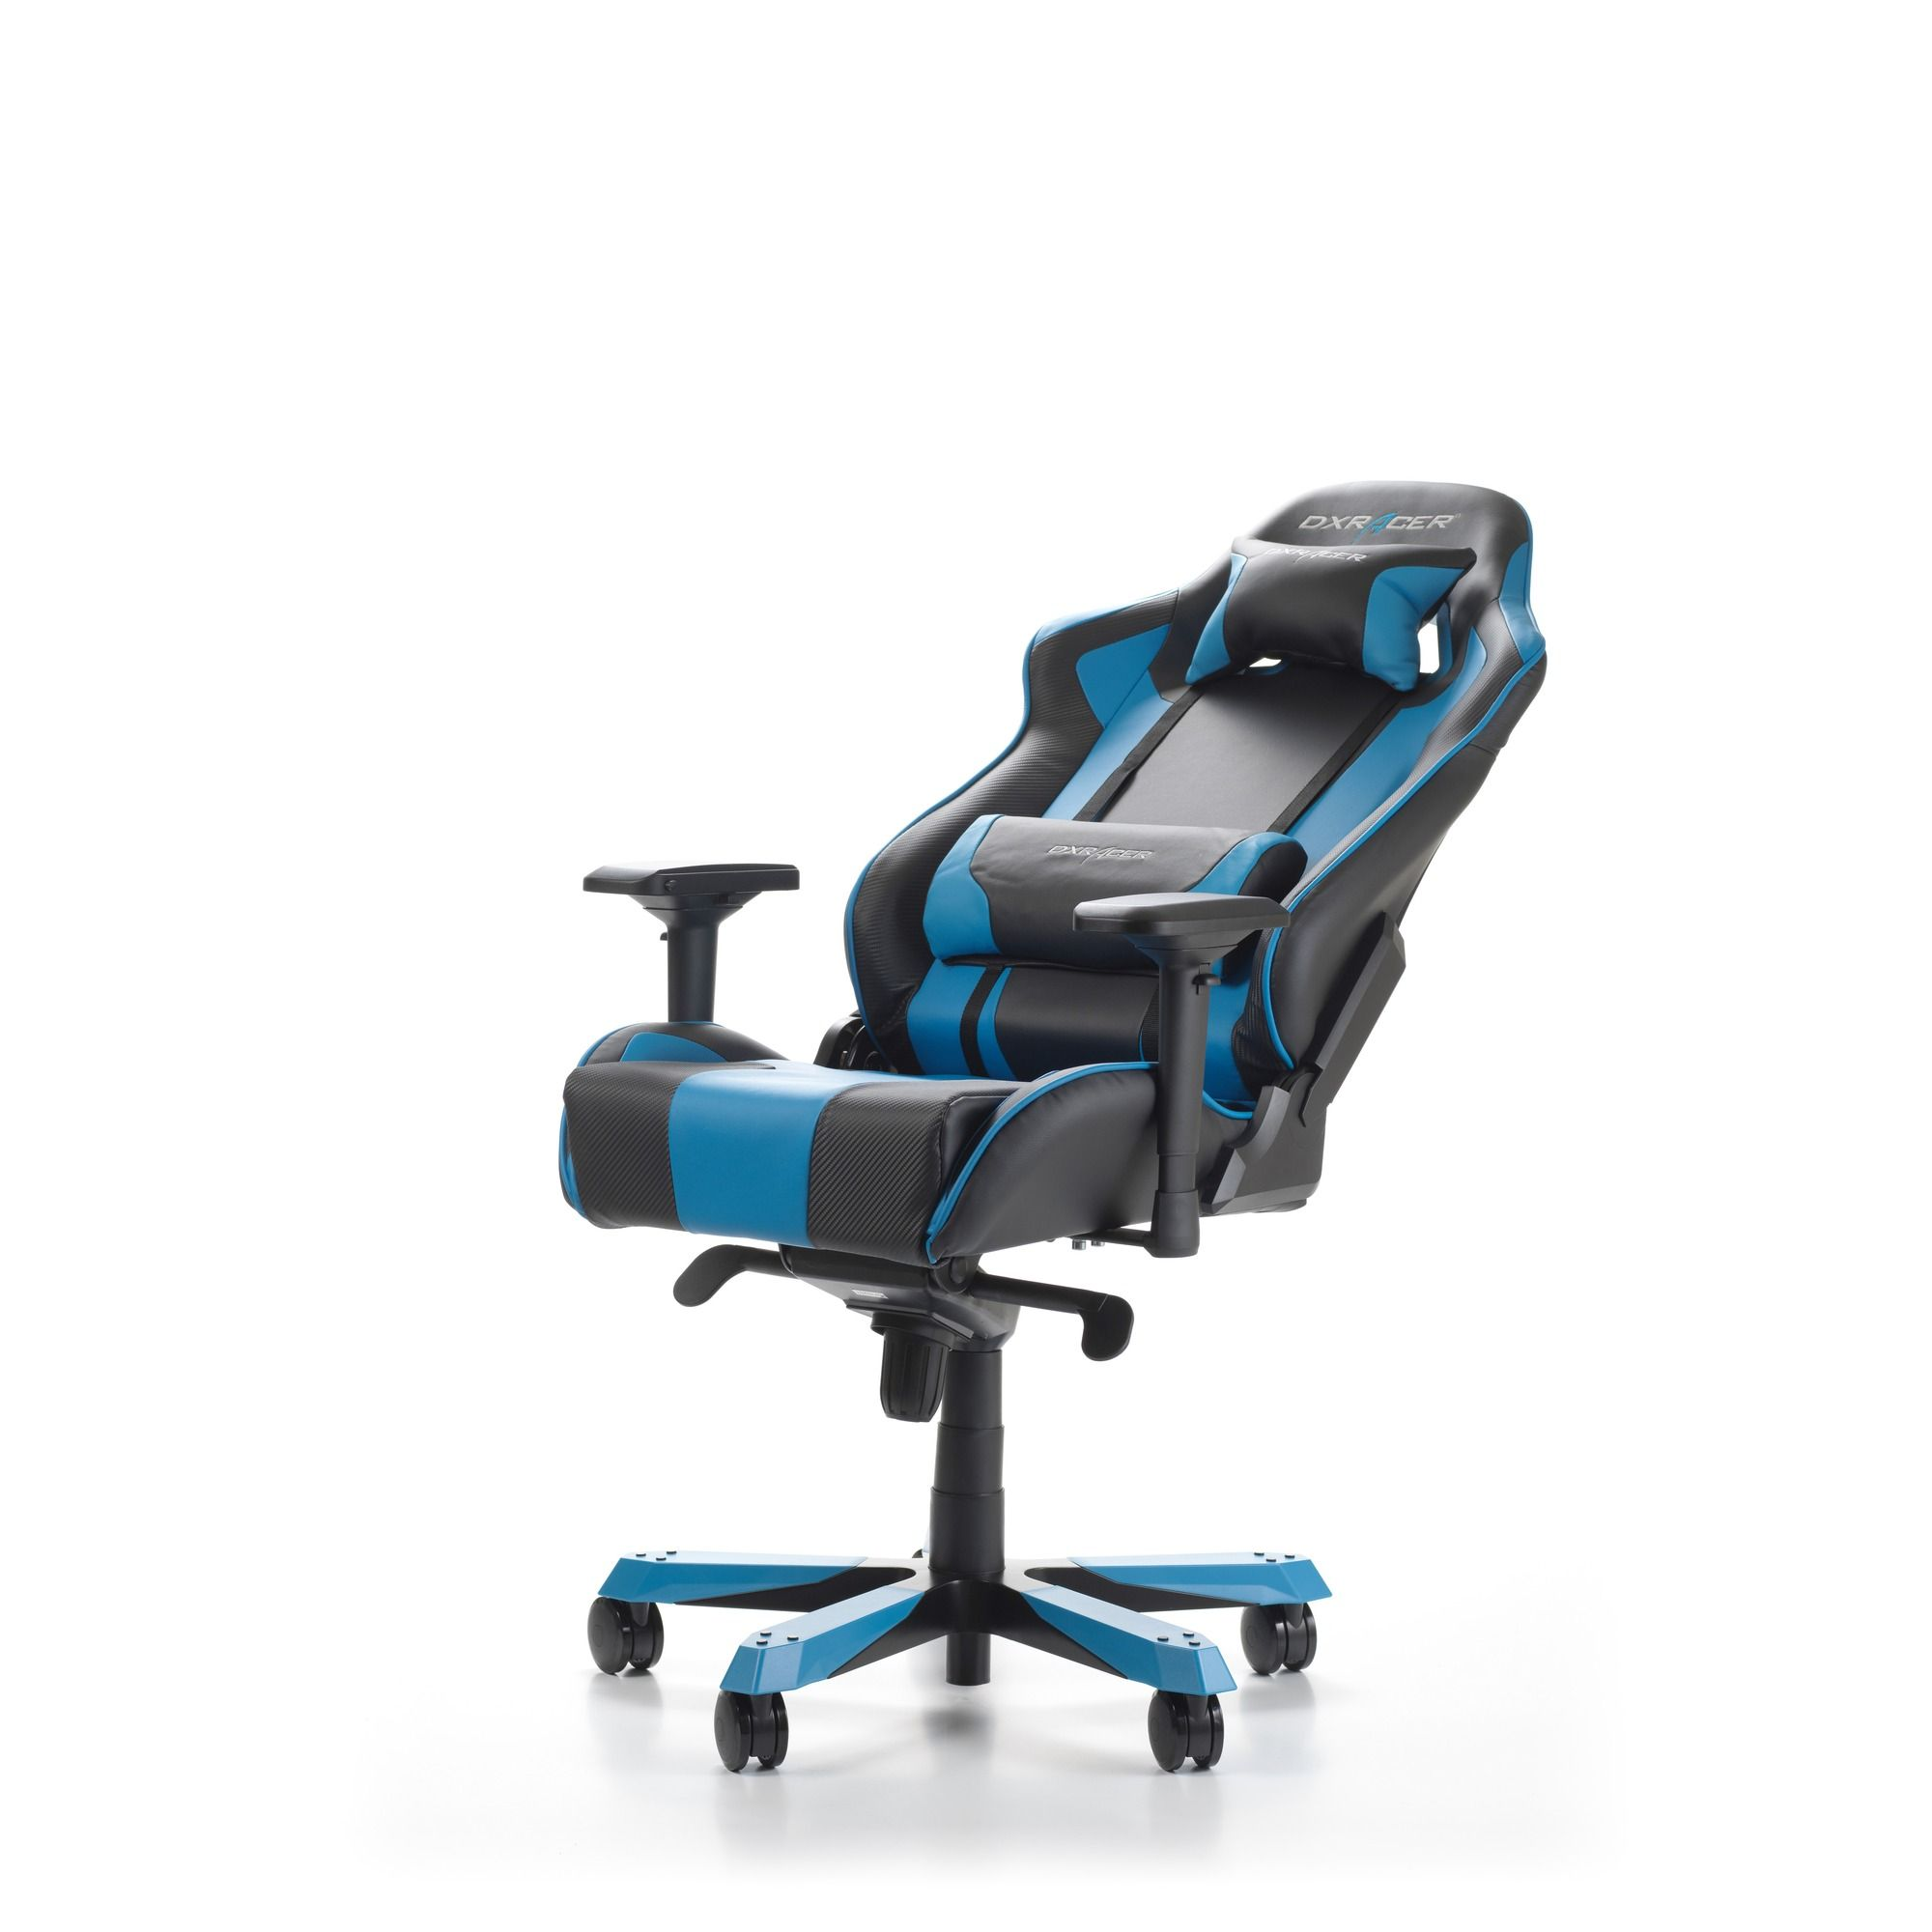 Геймърски стол DXRacer - серия KING, черен/син - OH/KS06/NB - 4